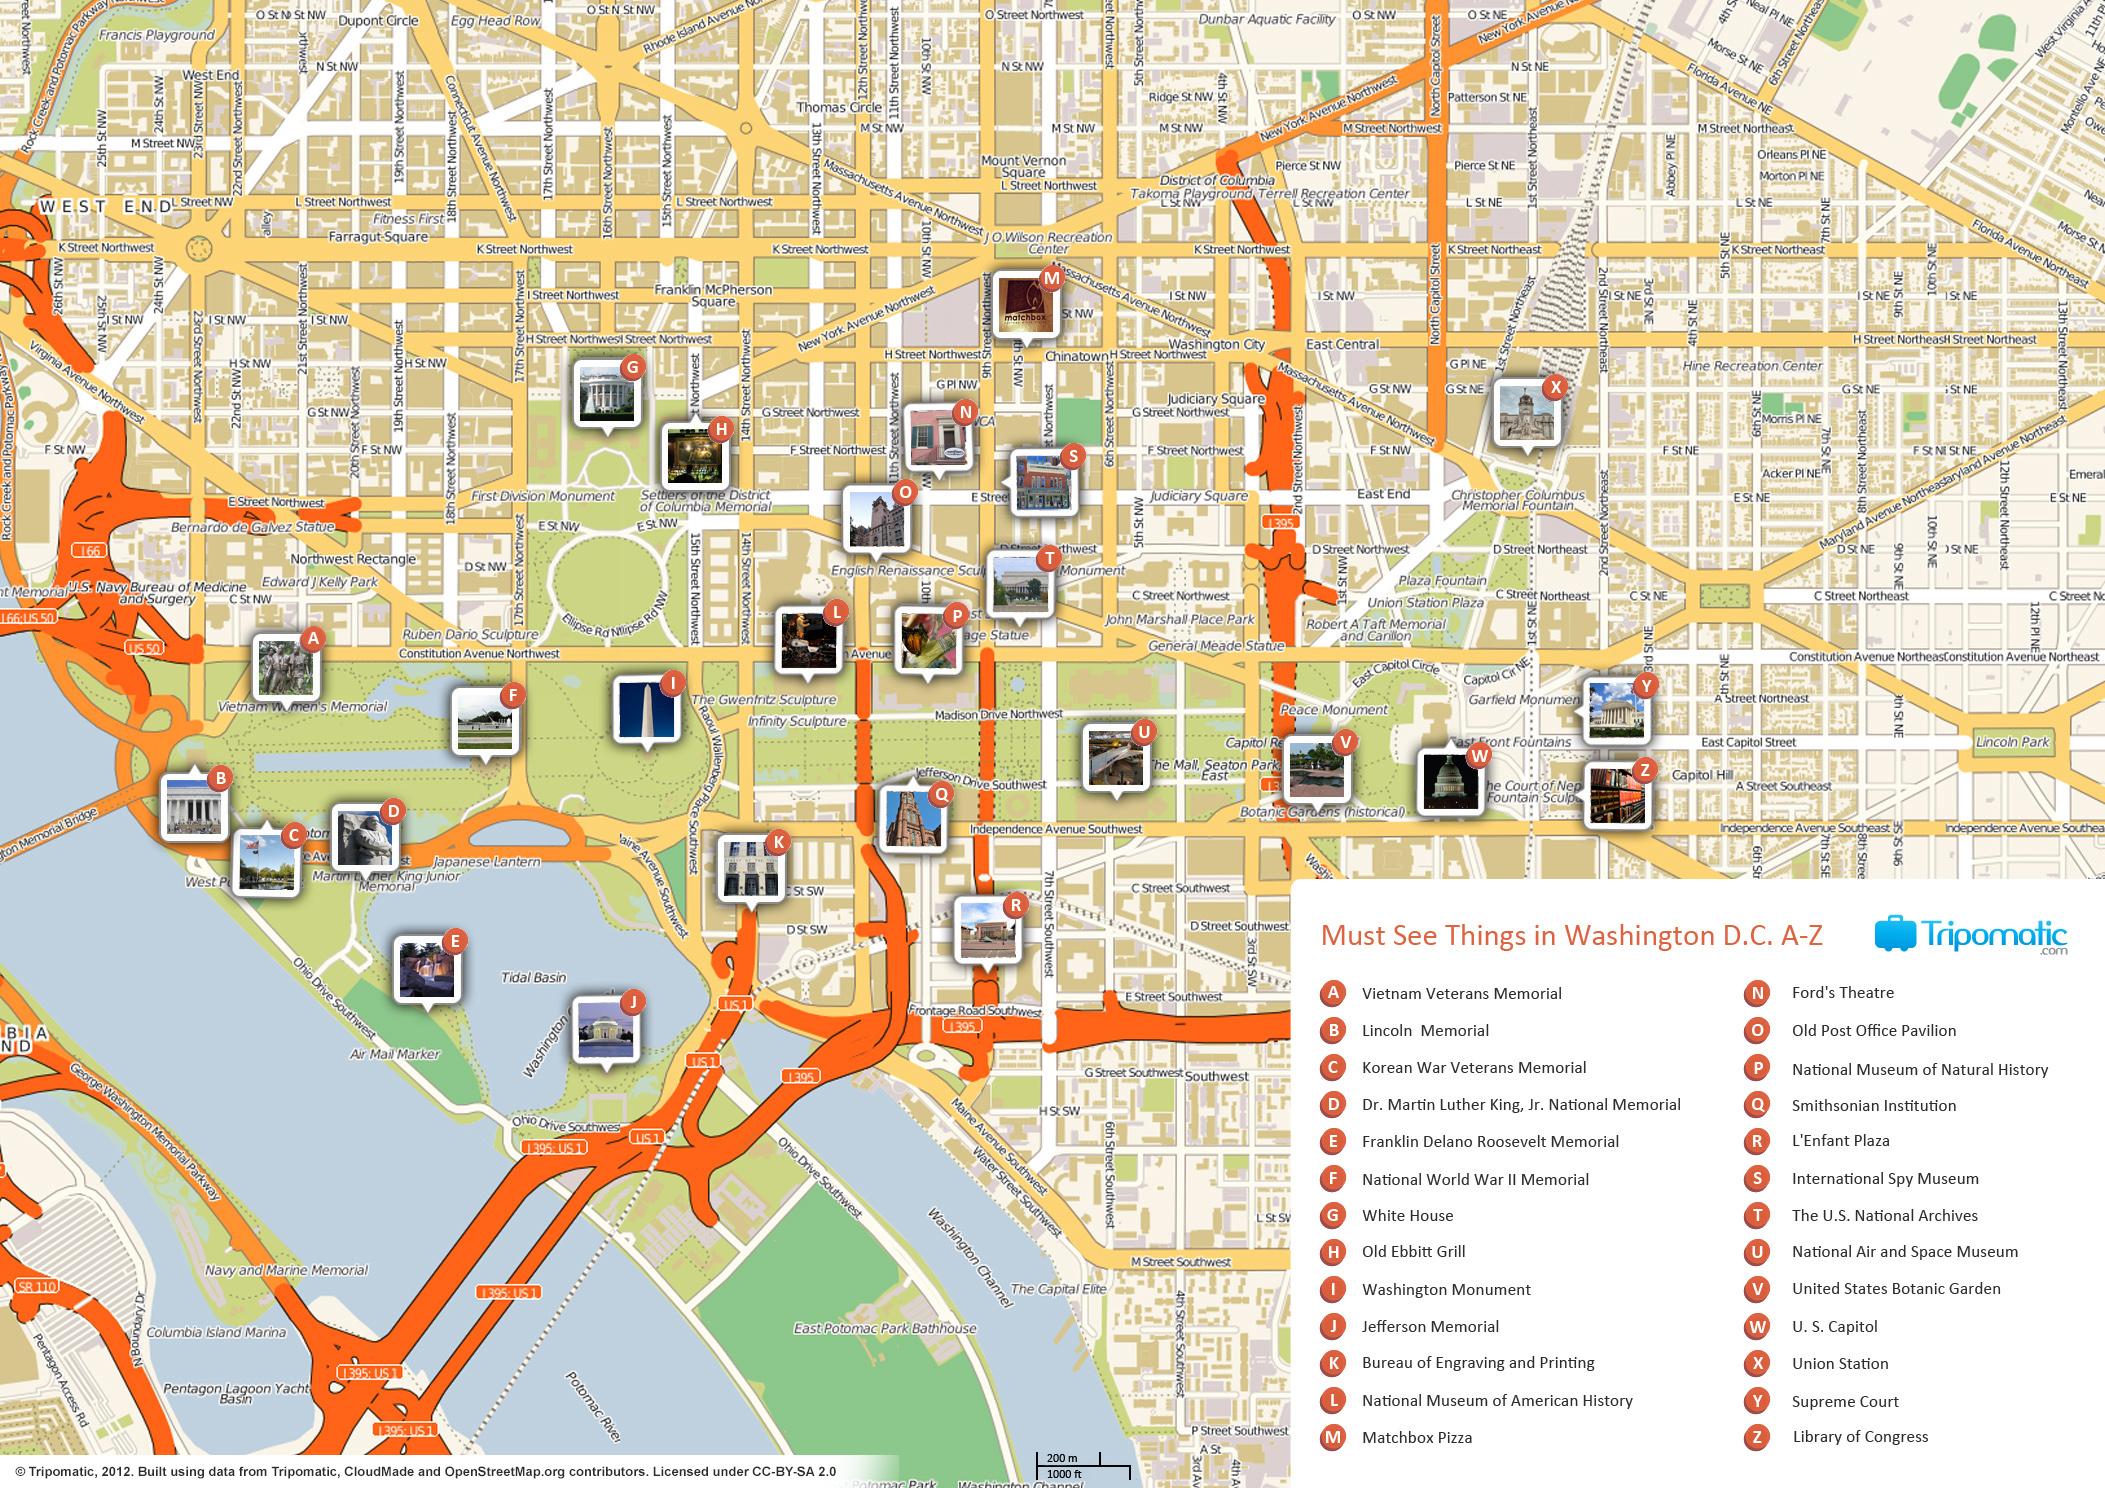 File:washington Dc Printable Tourist Attractions Map - Wikimedia - Printable Map Of Washington Dc